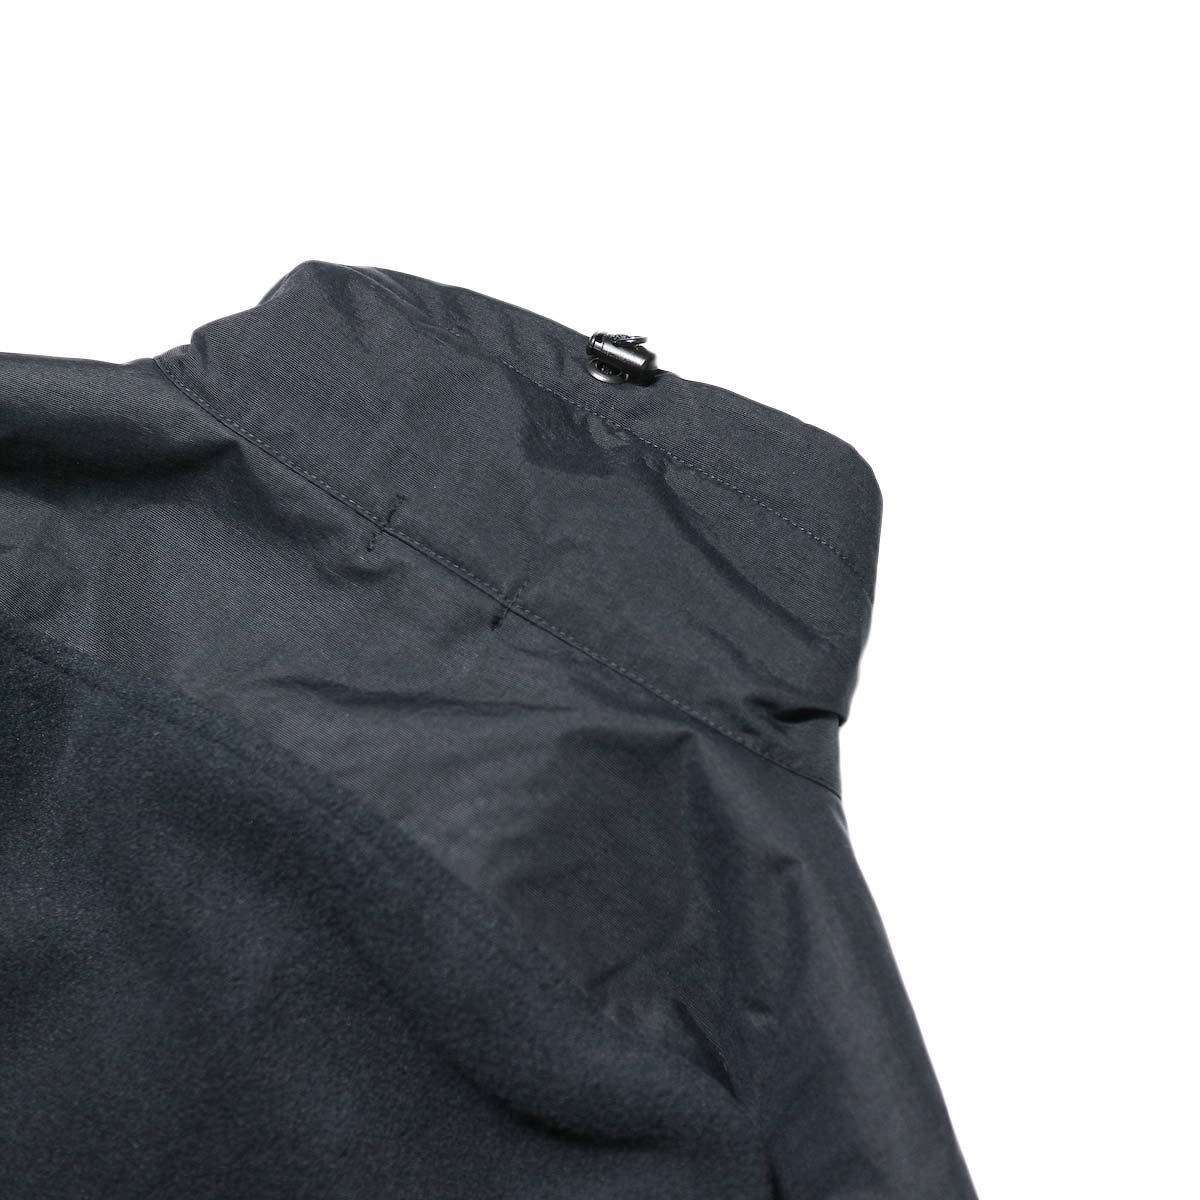 Marmot Histric Collection / Alpinist Tech Sweater (Black×Black)襟スピンドル